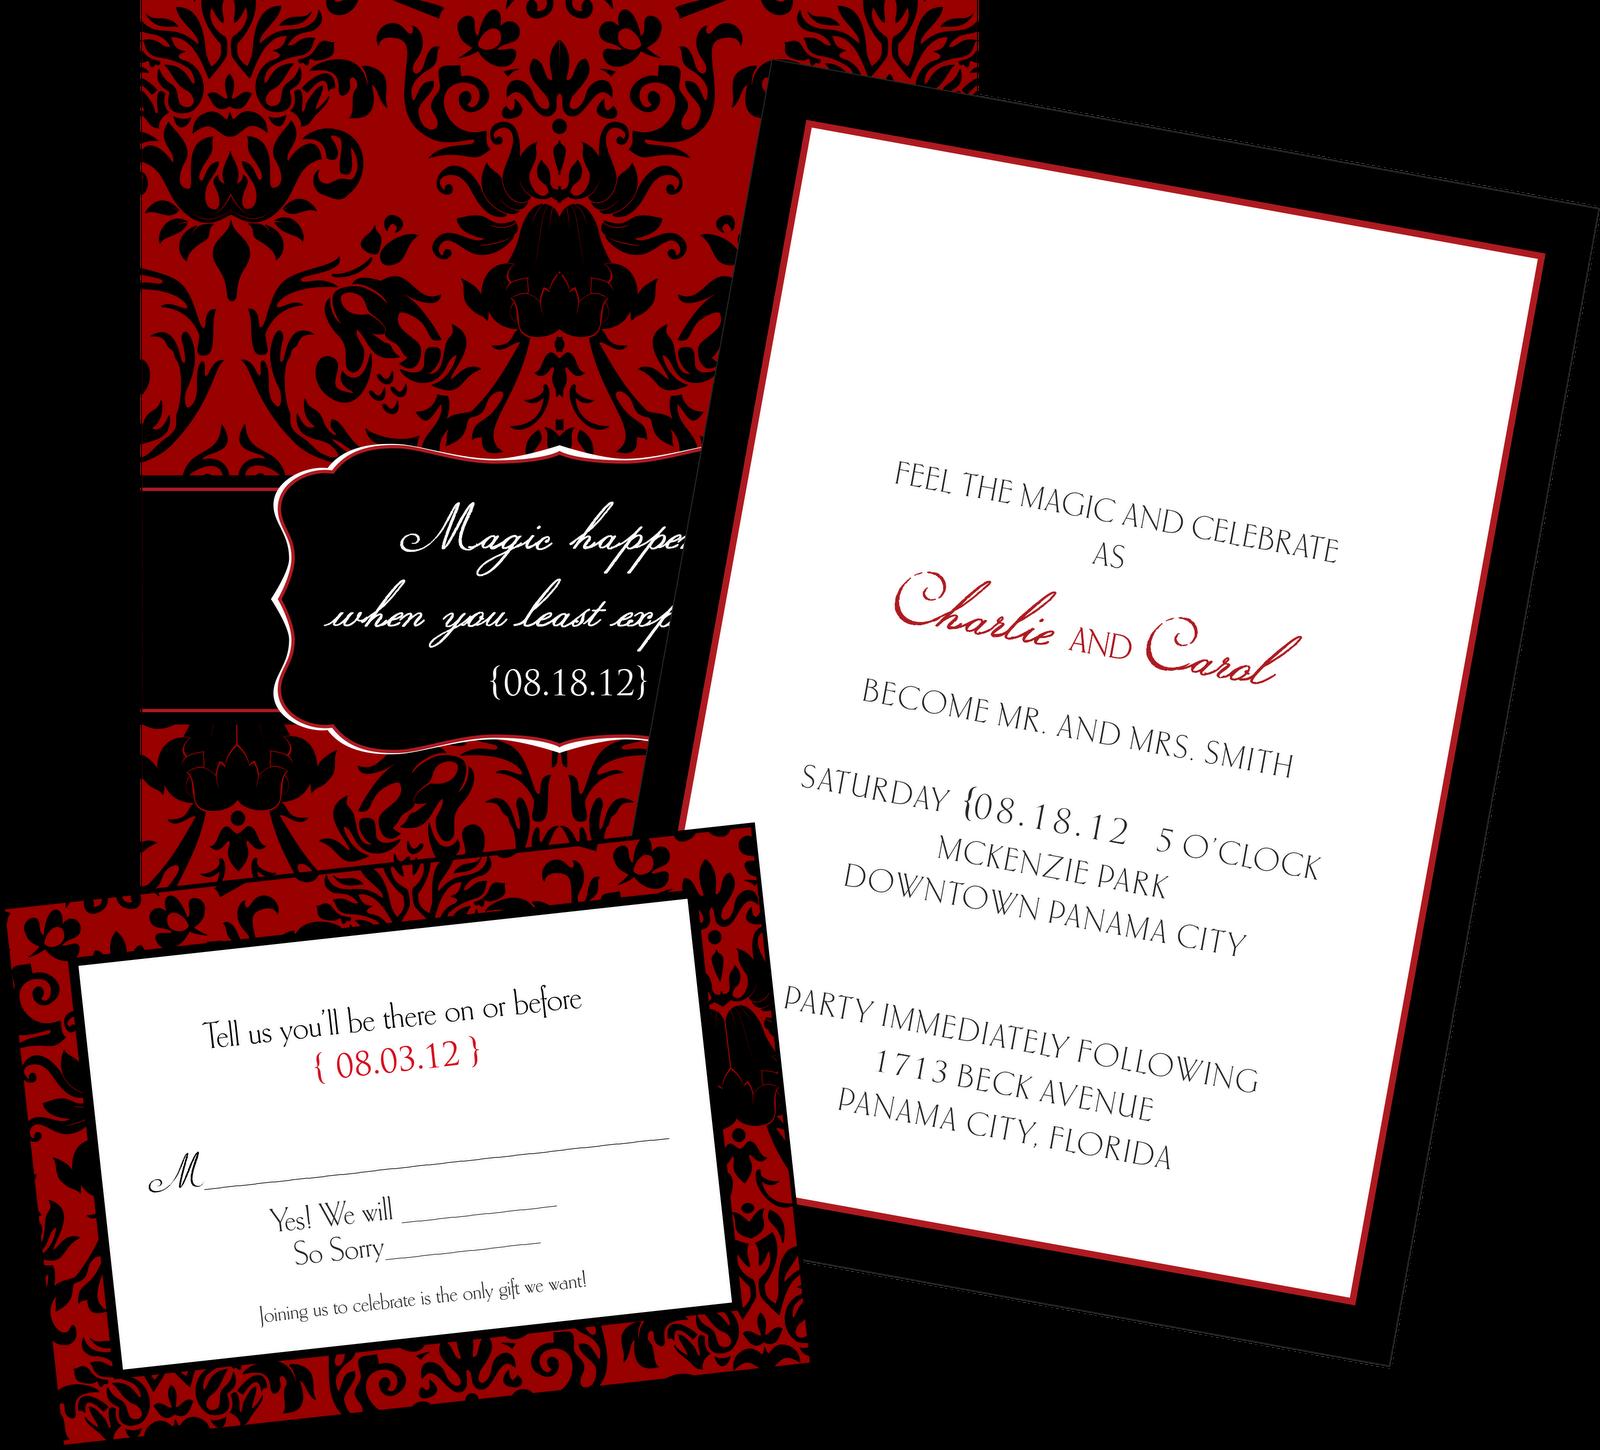 Rsvp Date For Wedding Invites | PaperInvite